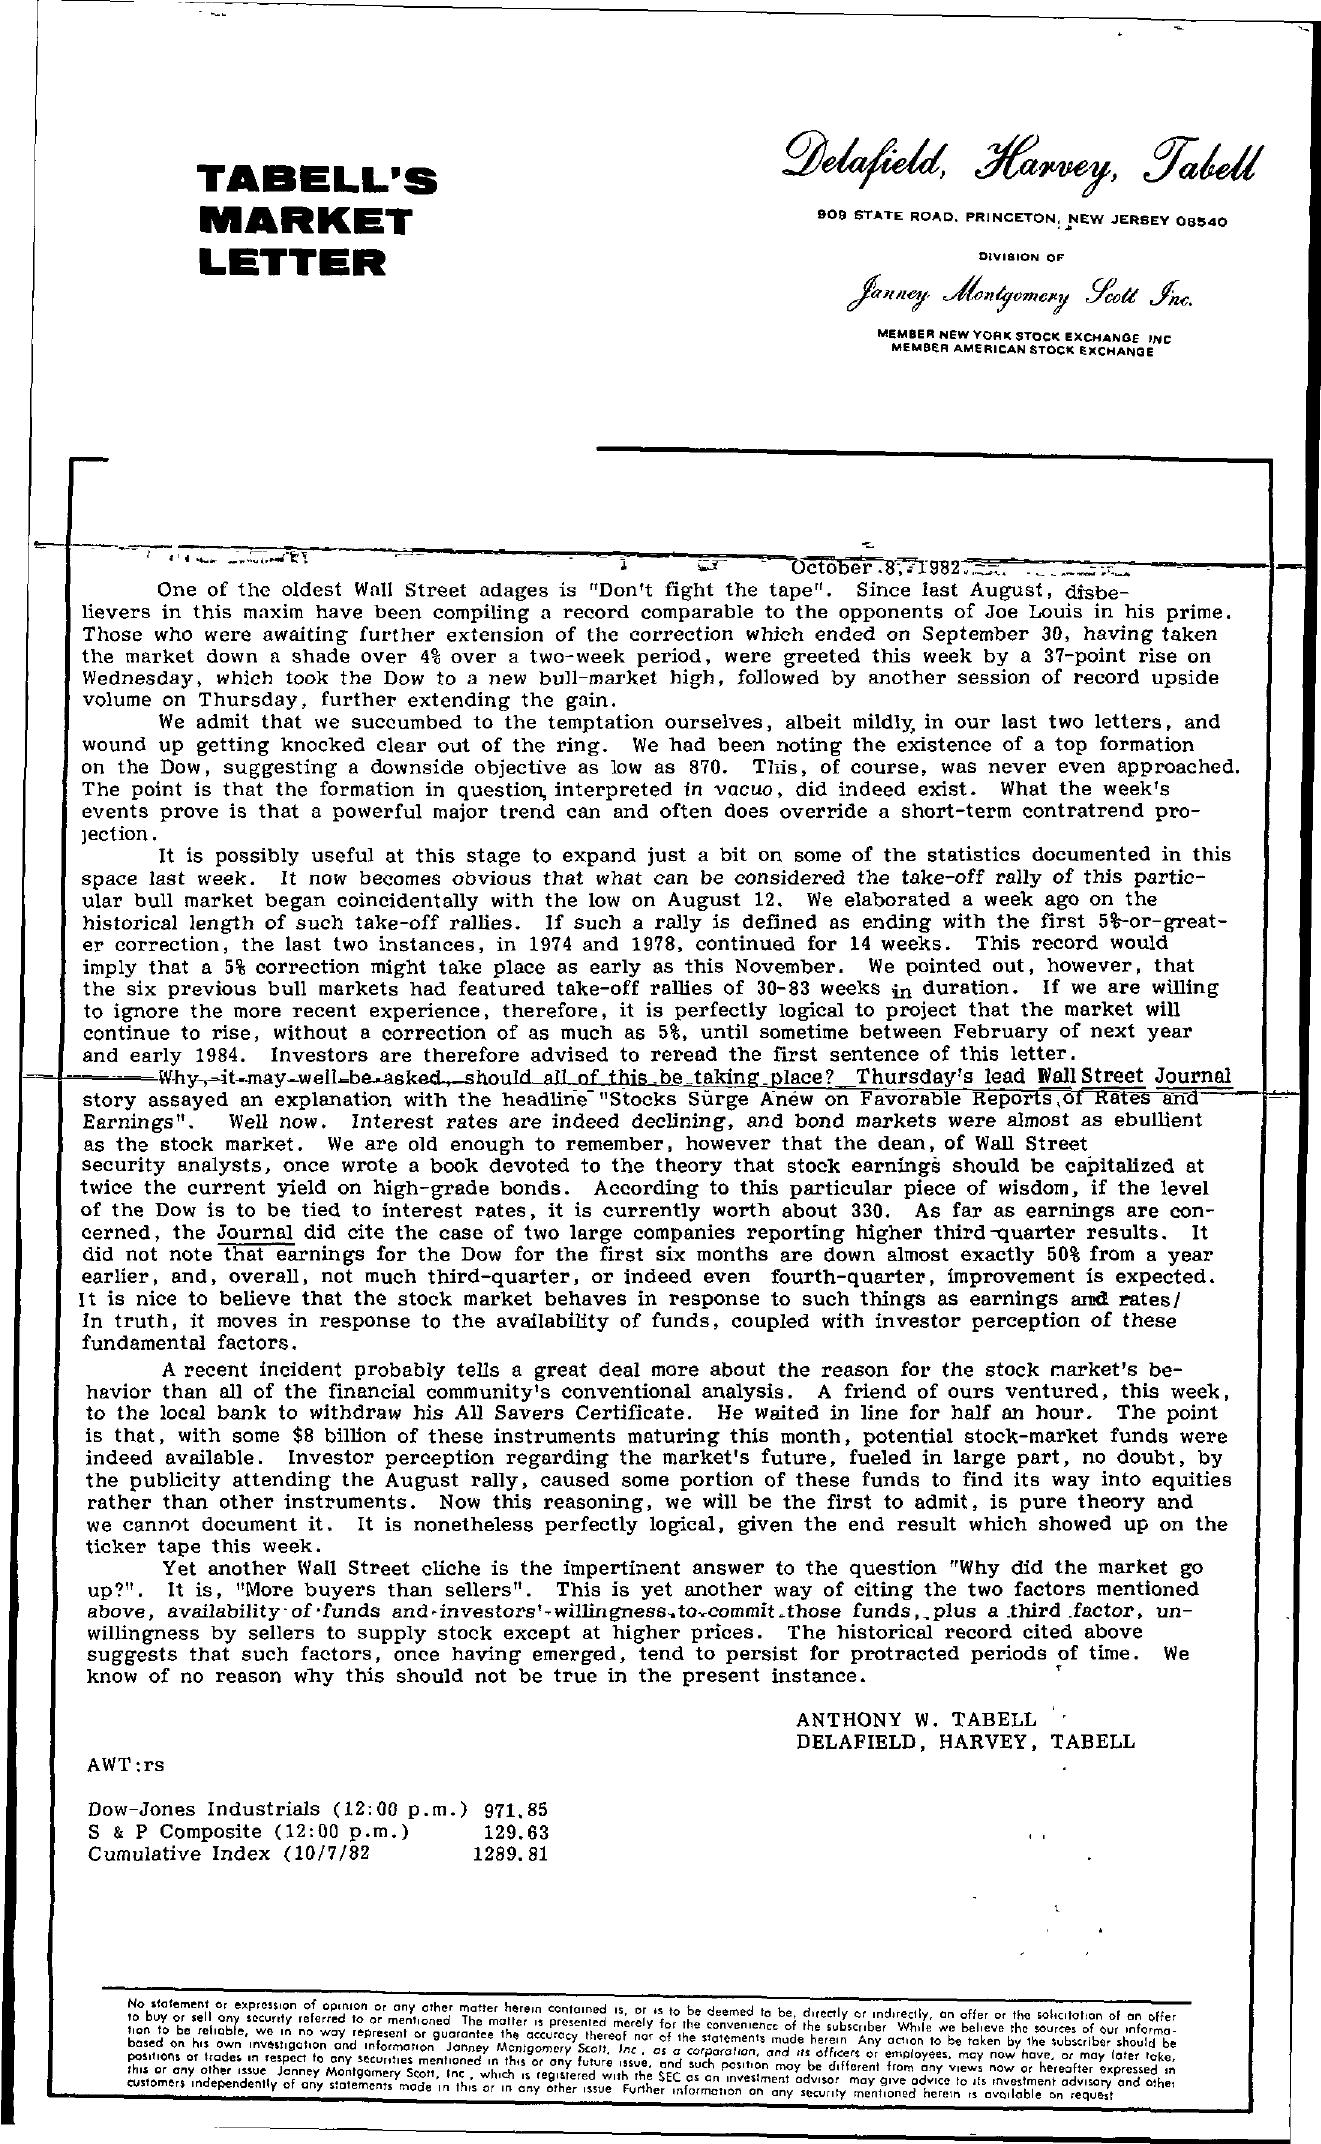 Tabell's Market Letter - October 08, 1982